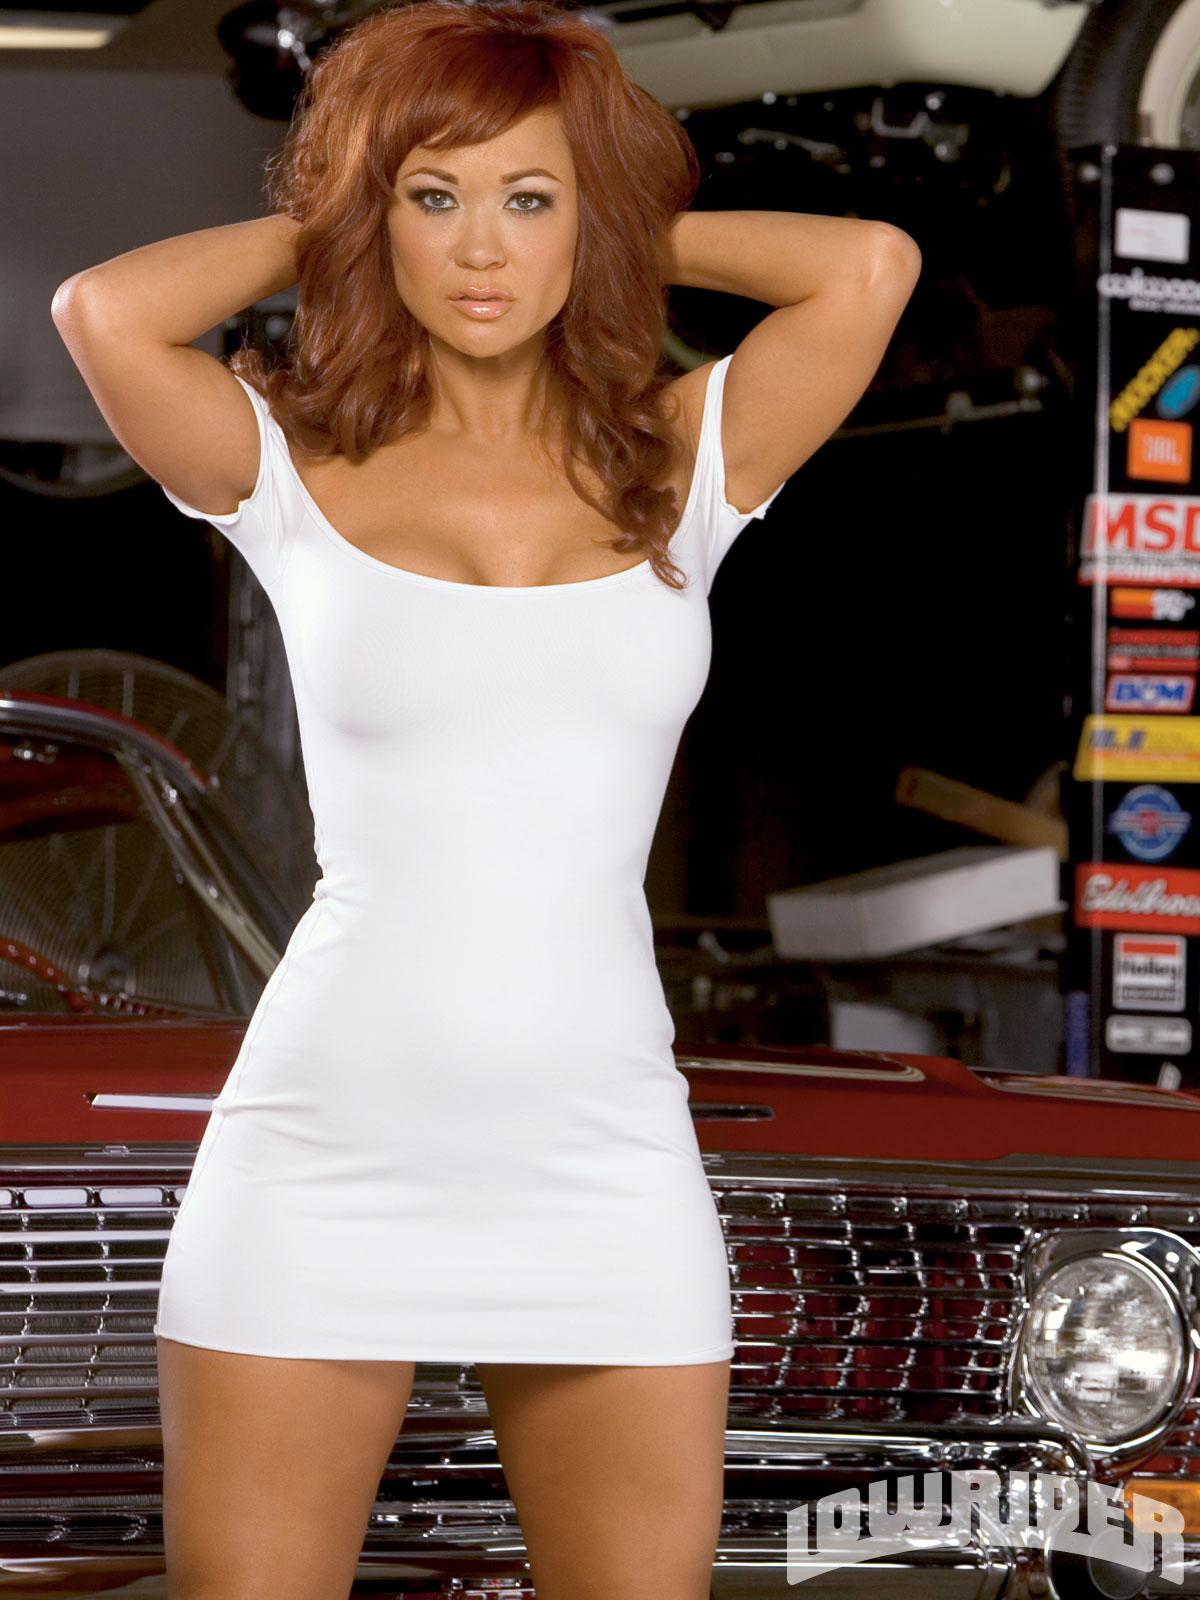 Sheila Smith - Lowrider Girls Model - Lowrider Girls Magazine